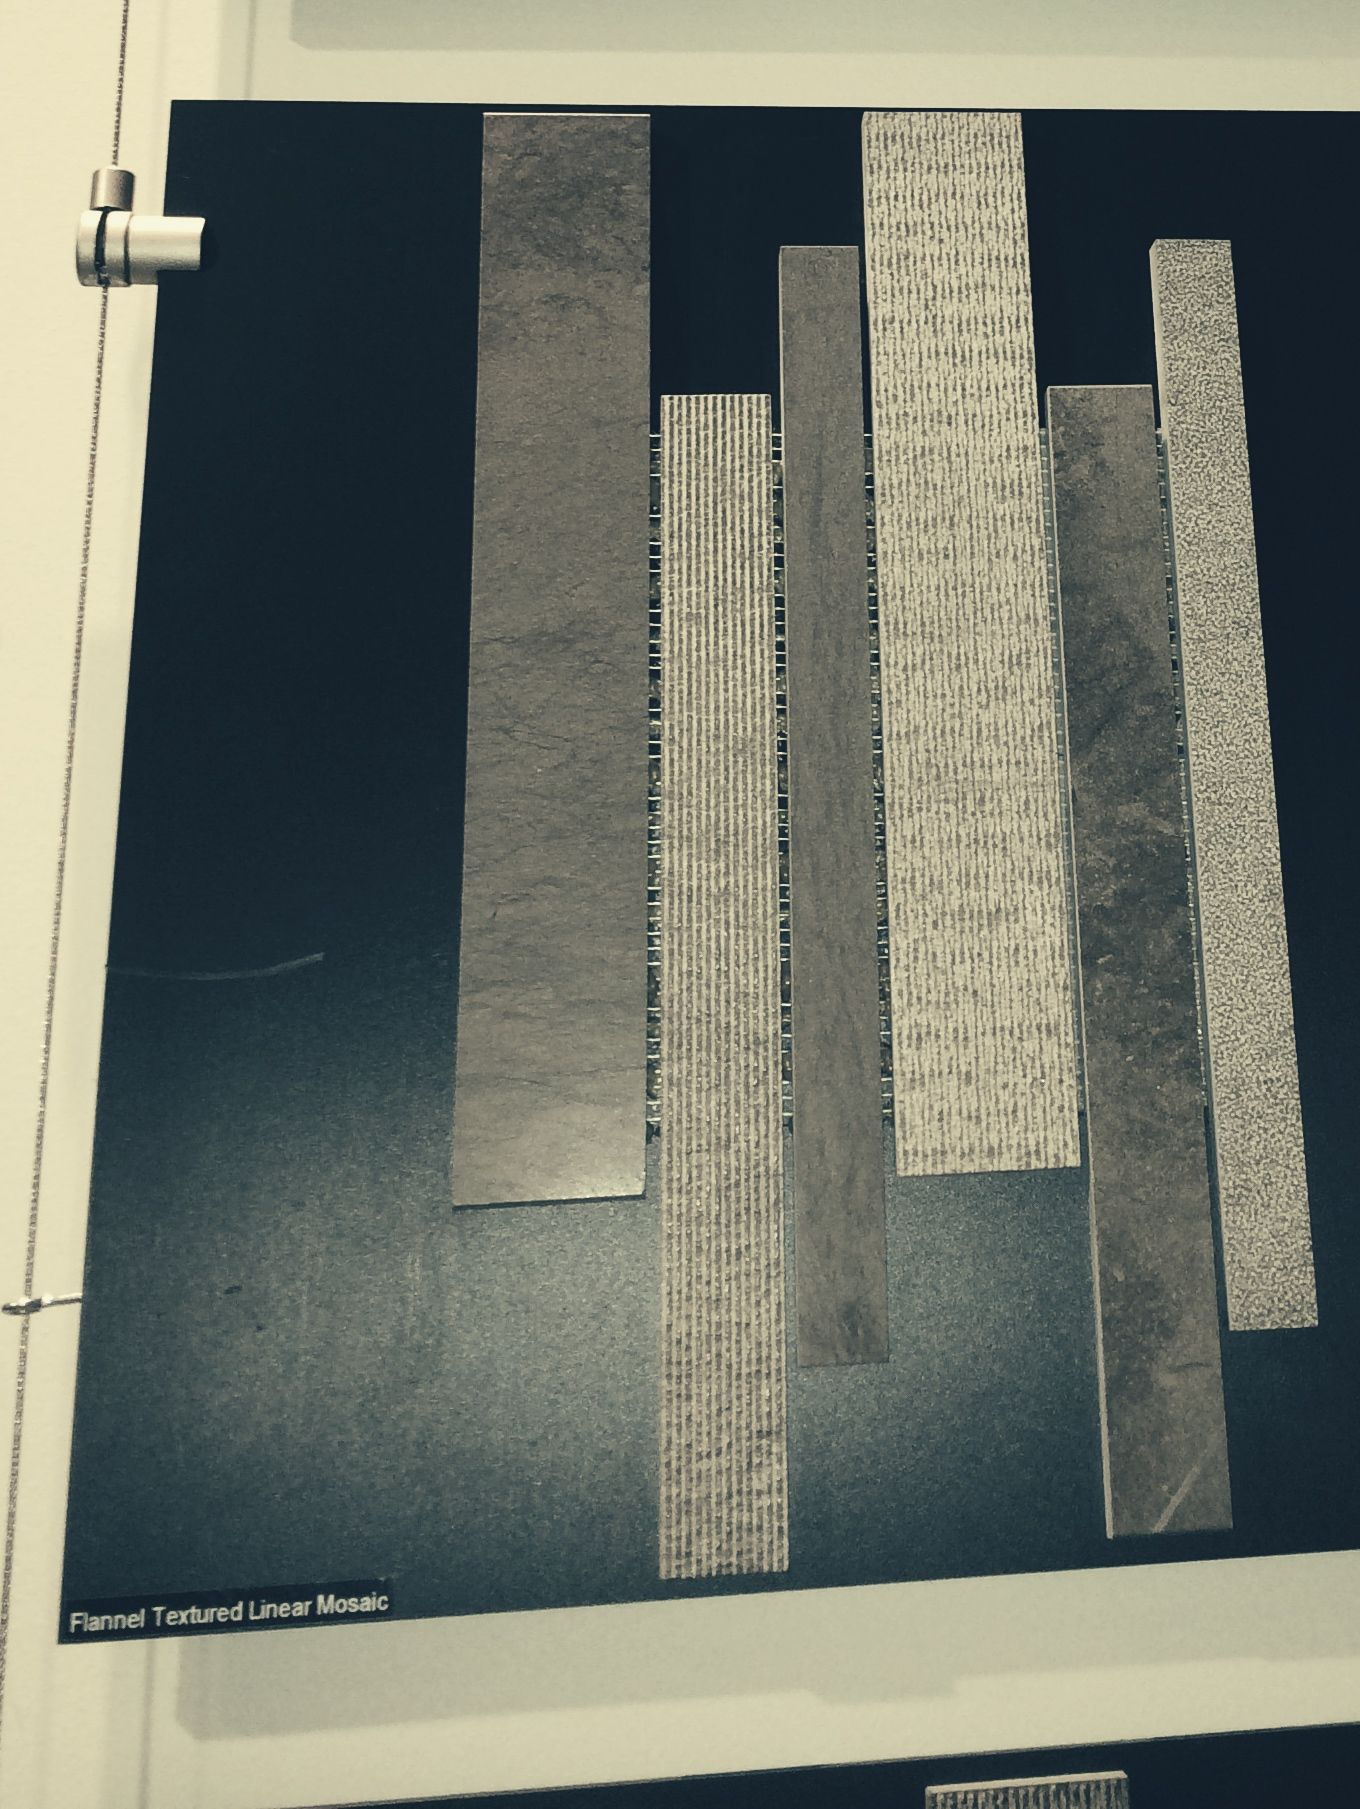 WZ- Flannel Textured Linear Mosaic